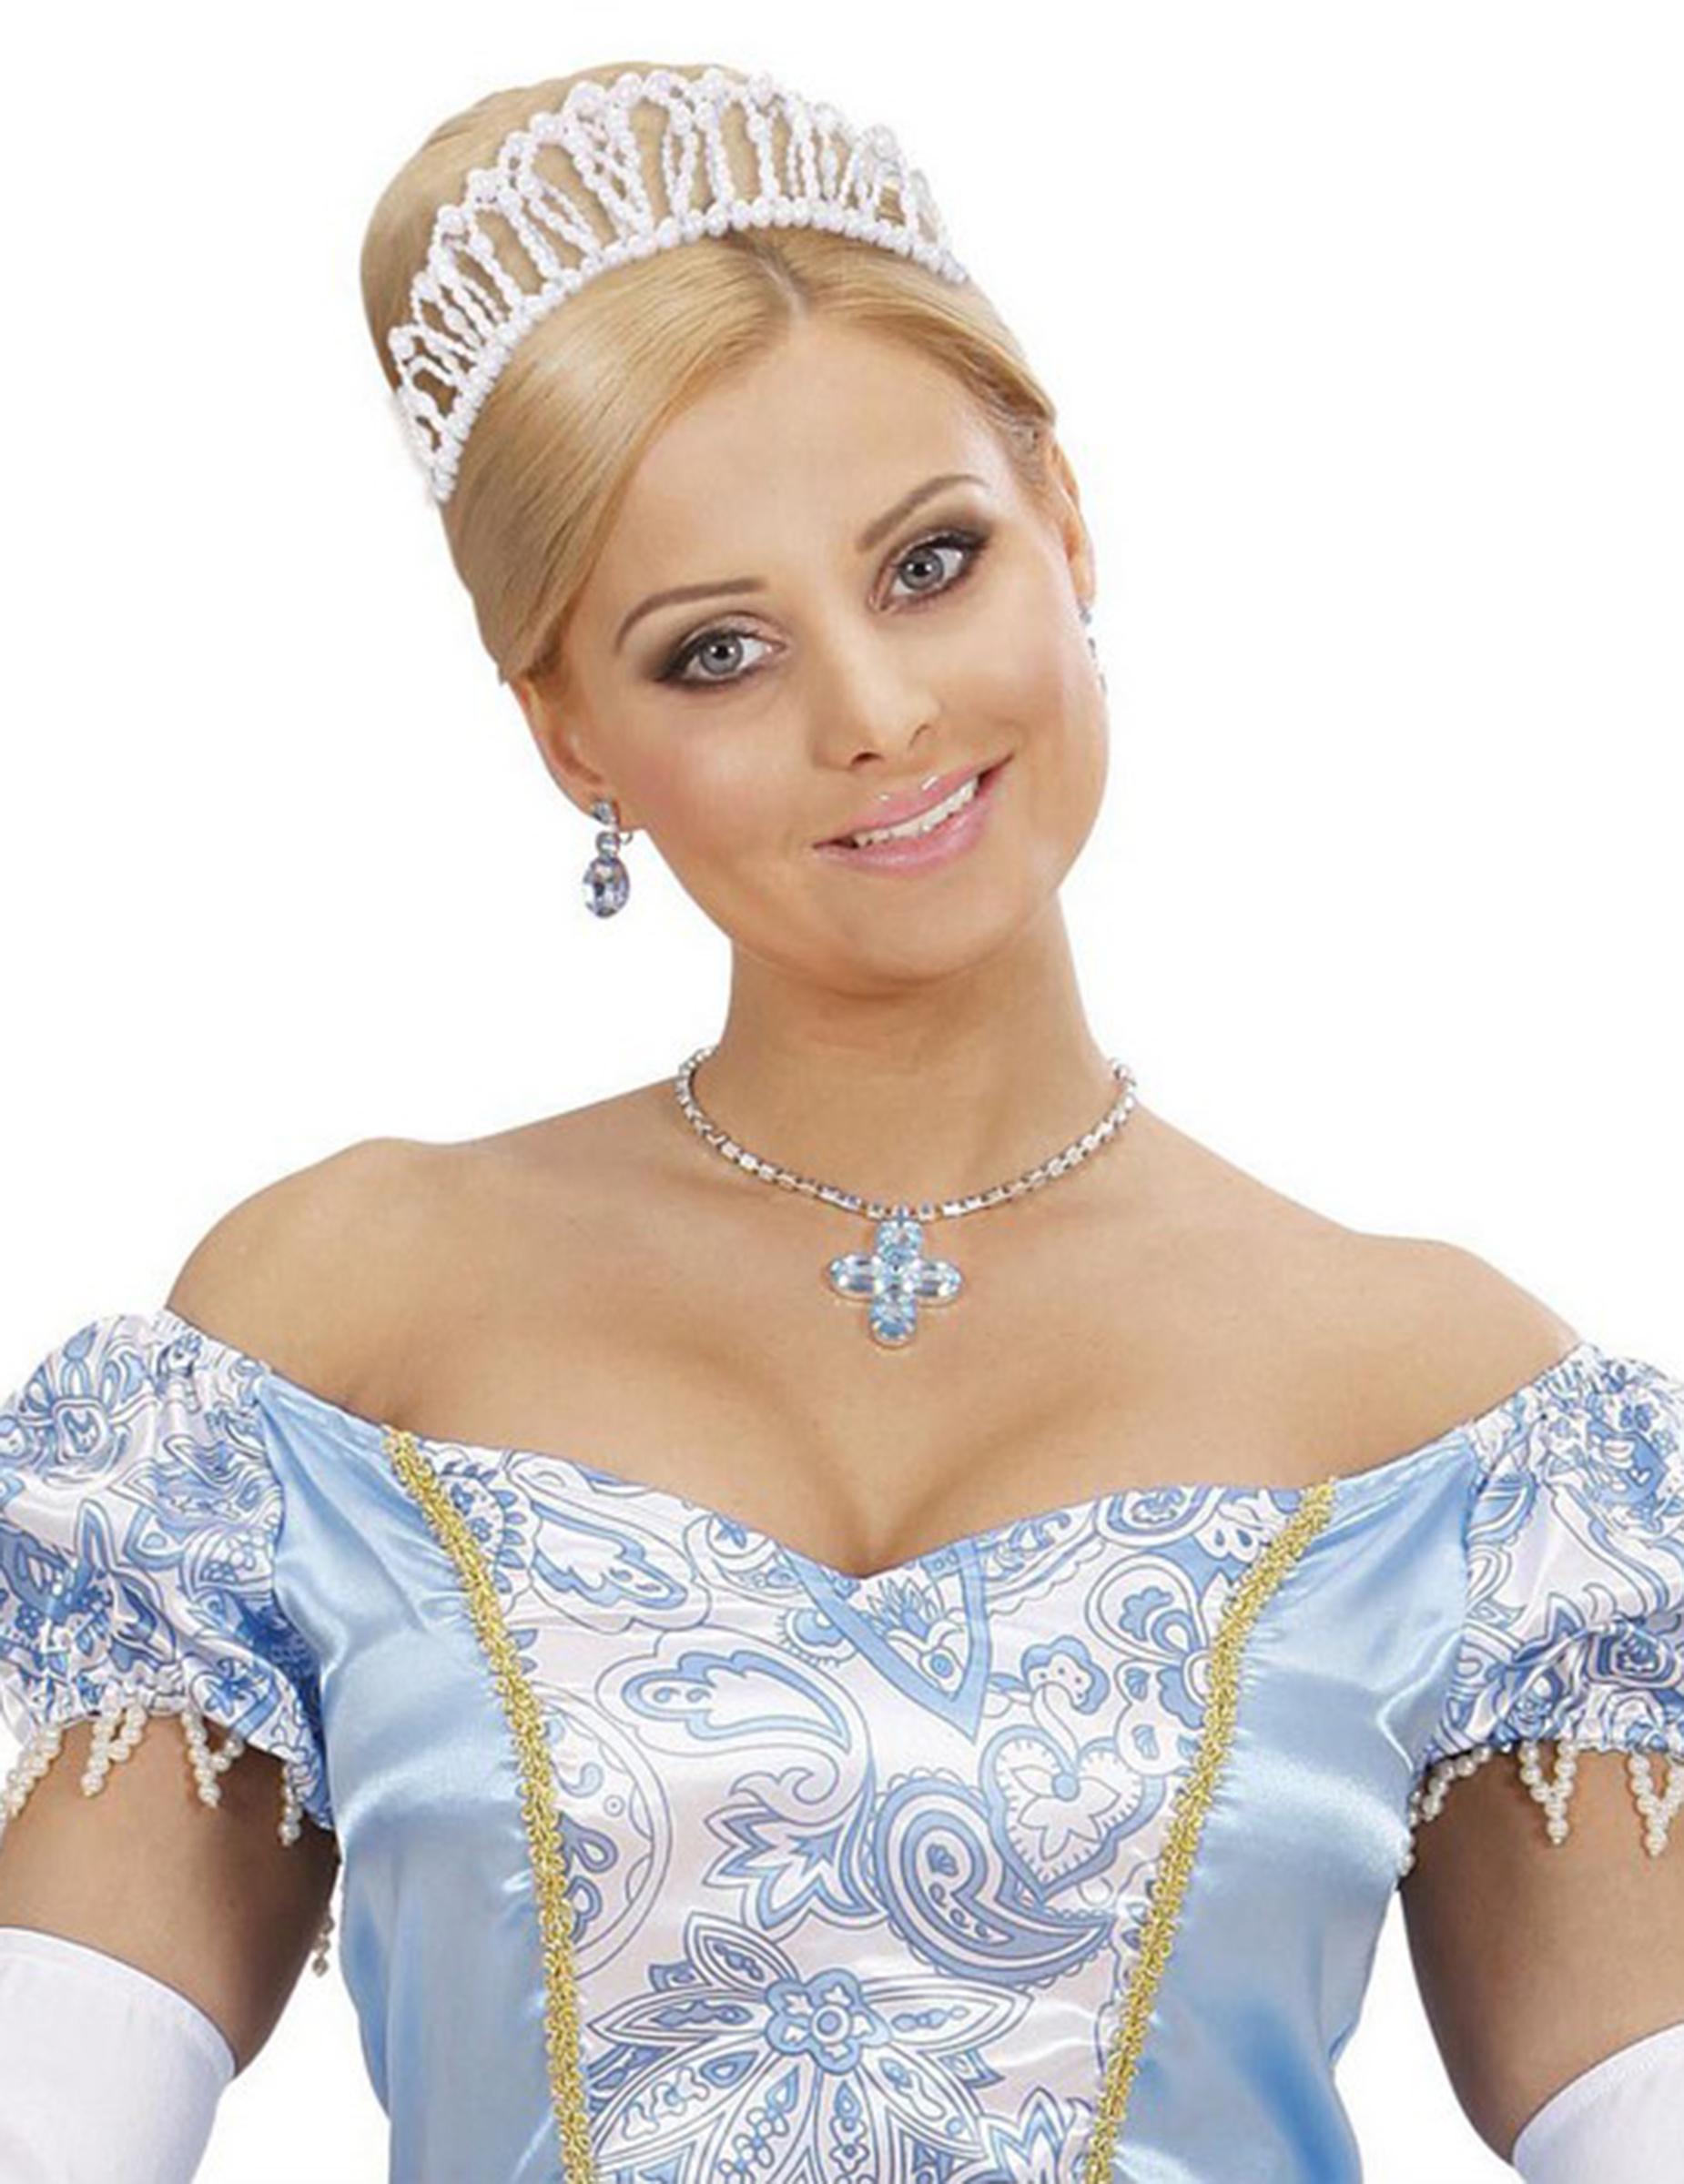 Perlen Diadem Prinzessinnen Krone Weiss Gunstige Faschings